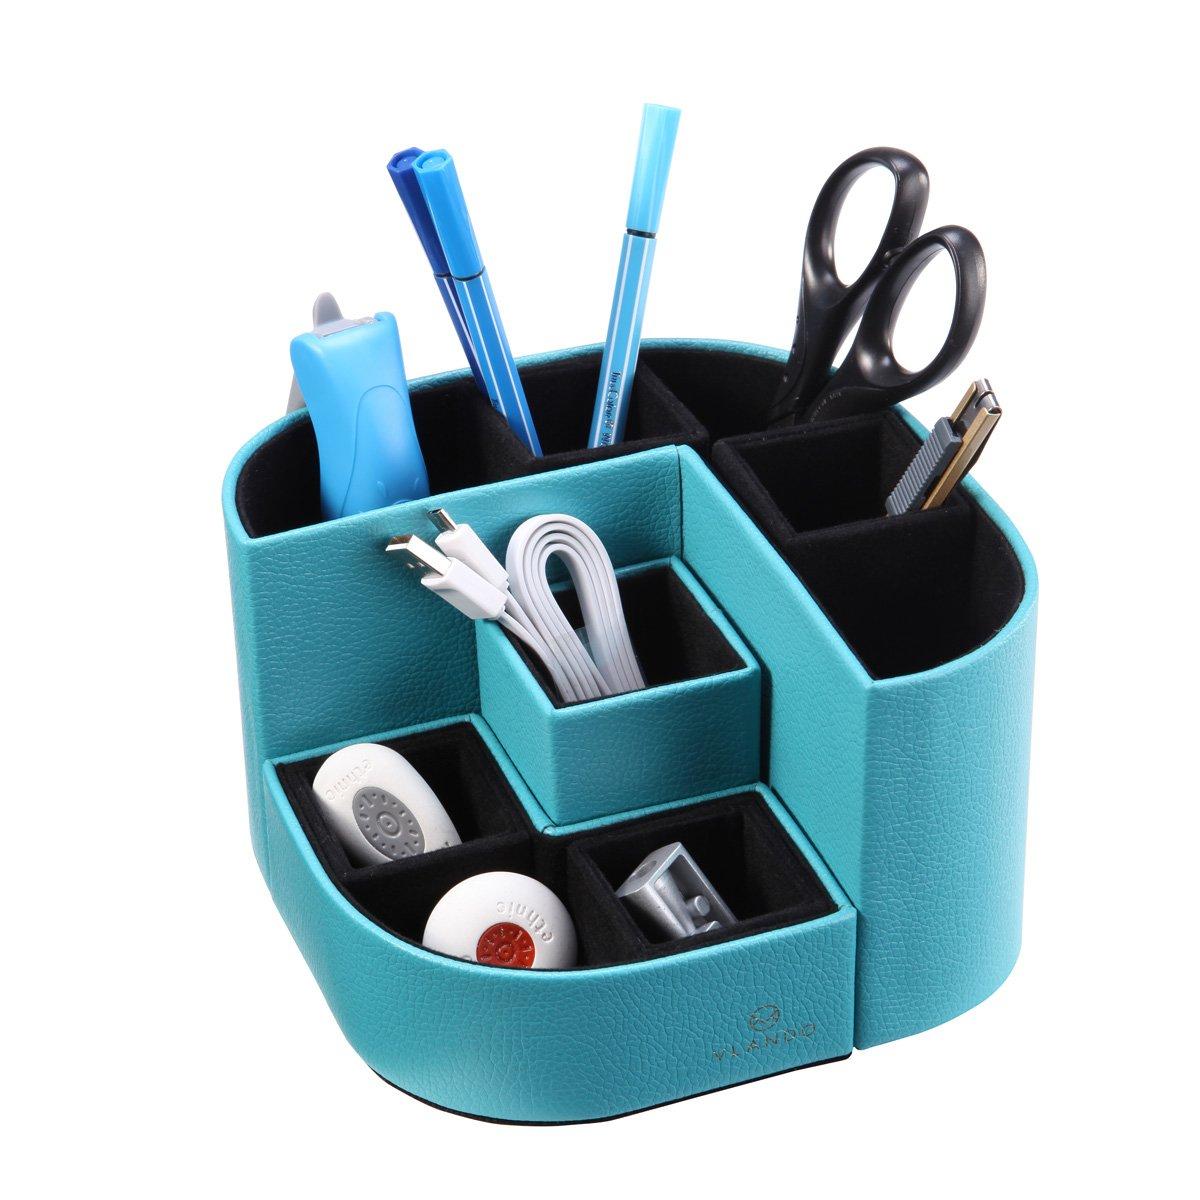 VPACK Magnet Desk Organizer - Pencil Cup Pen Holder - Office Supplies Desktop Stationery Gadgets Storage Box (Peacock Blue)